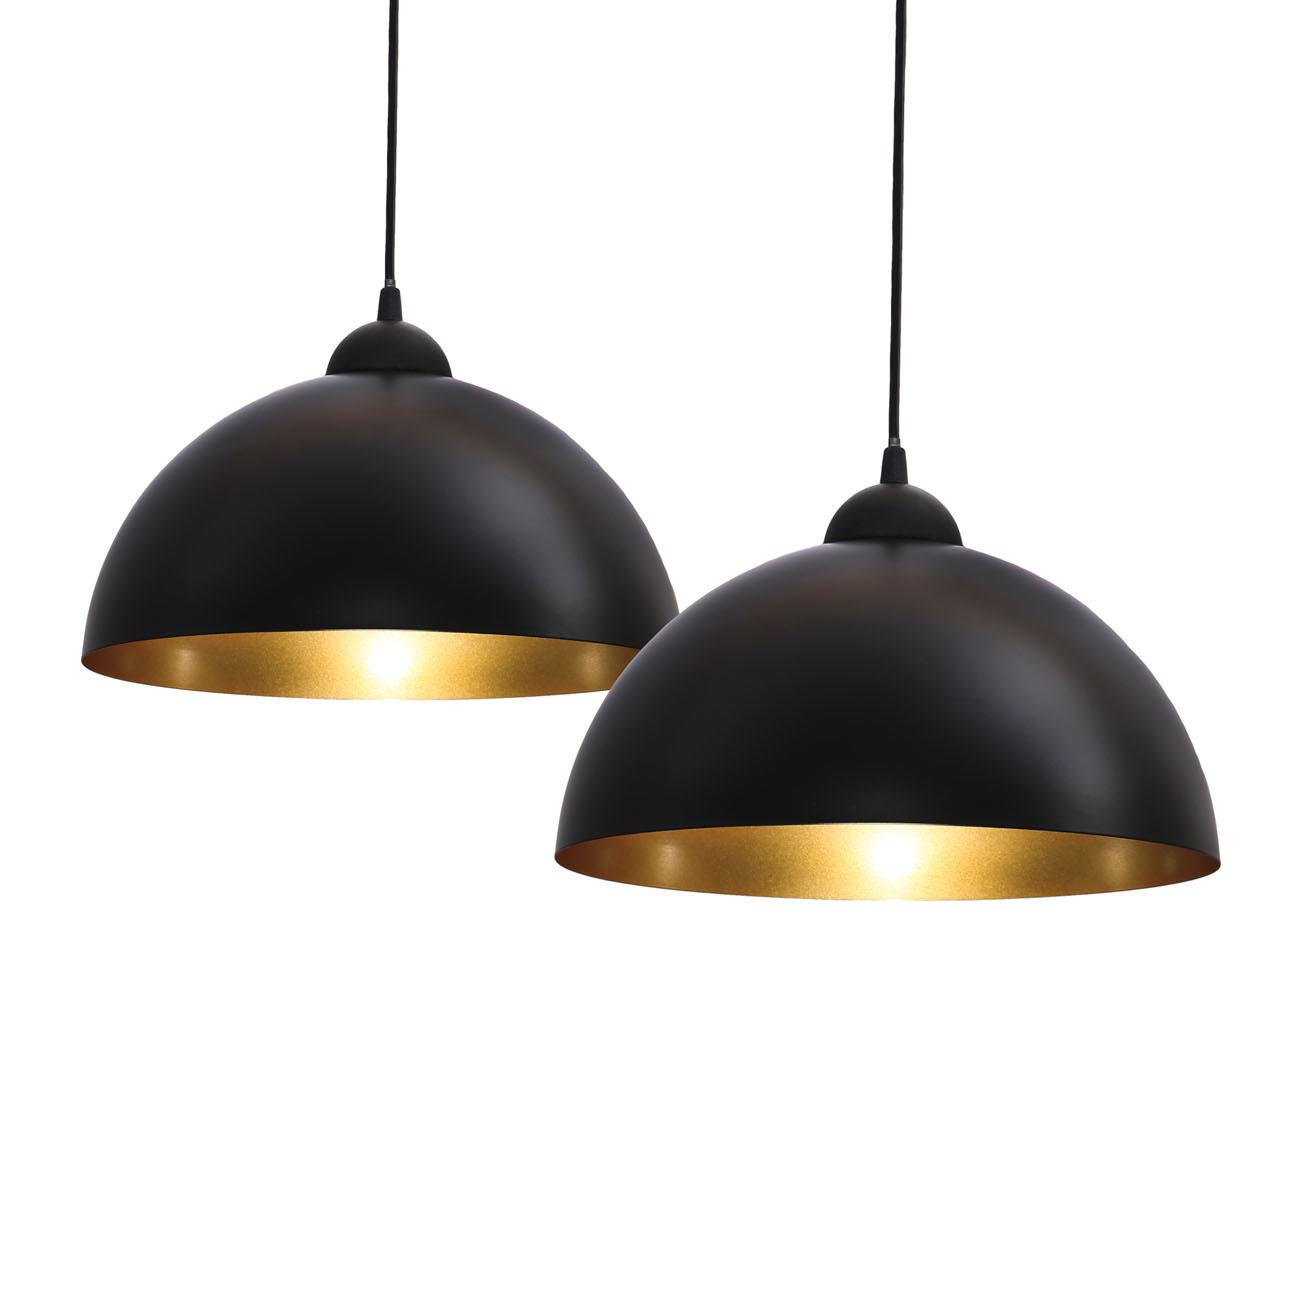 Pendelleuchte schwarz-gold E27 | 2er Set